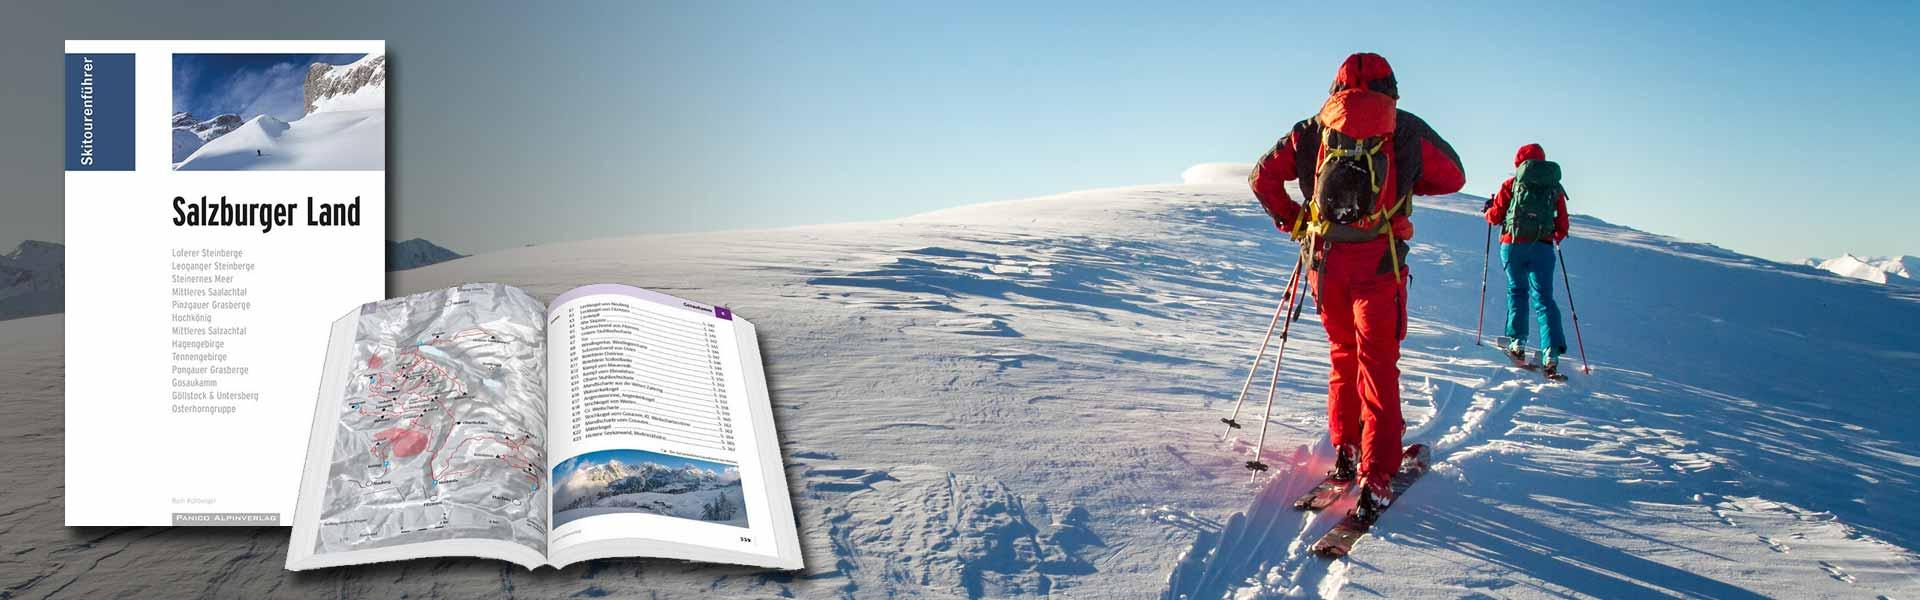 Skitourenführer Salzburger Land_Panico Verlag